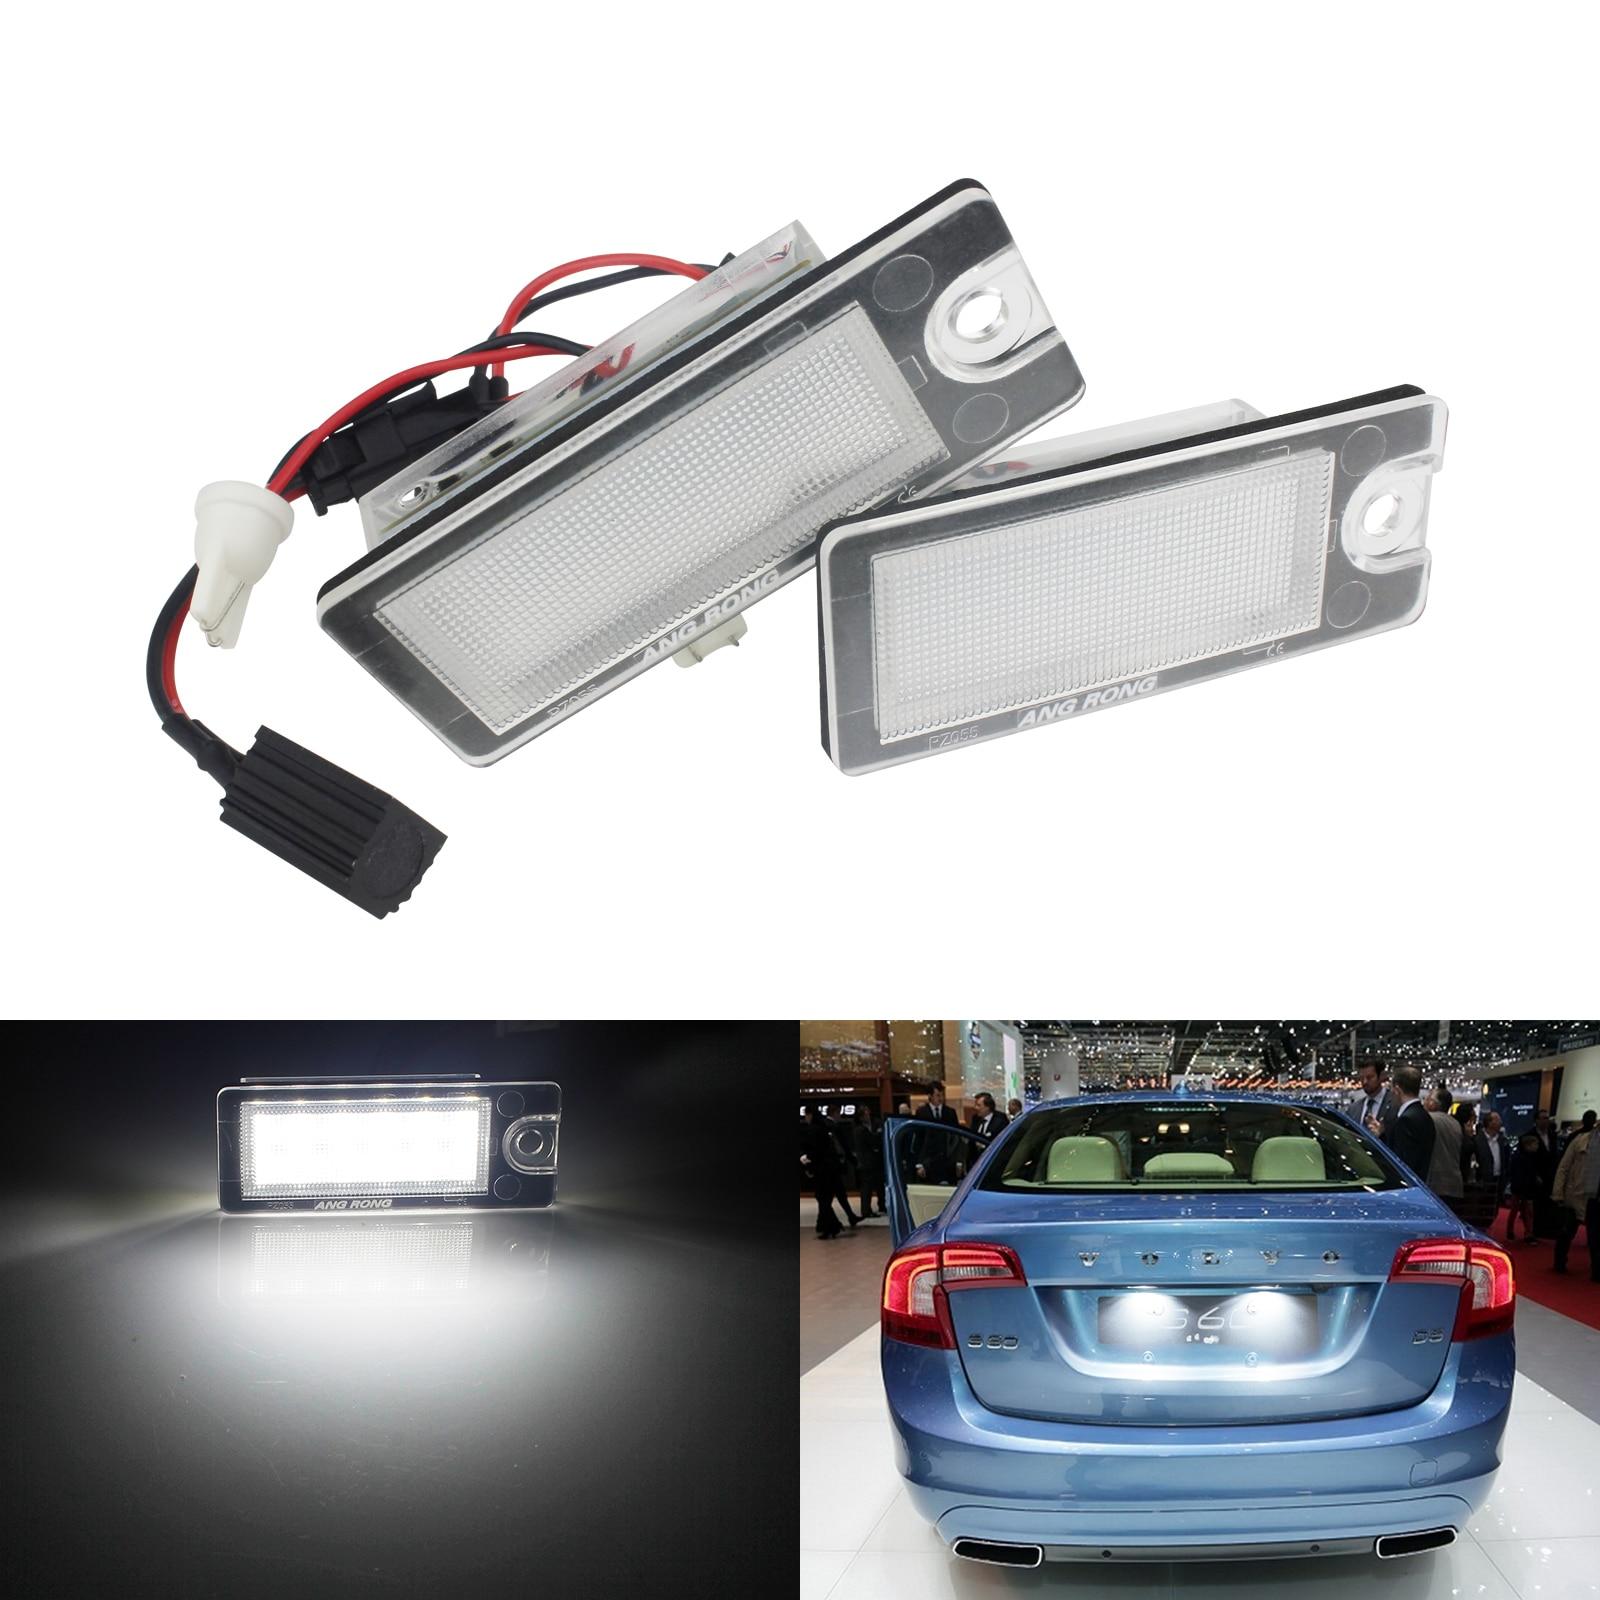 2x Volvo XC70 MK2 Bright Xenon White LED Number Plate Upgrade Light Bulbs